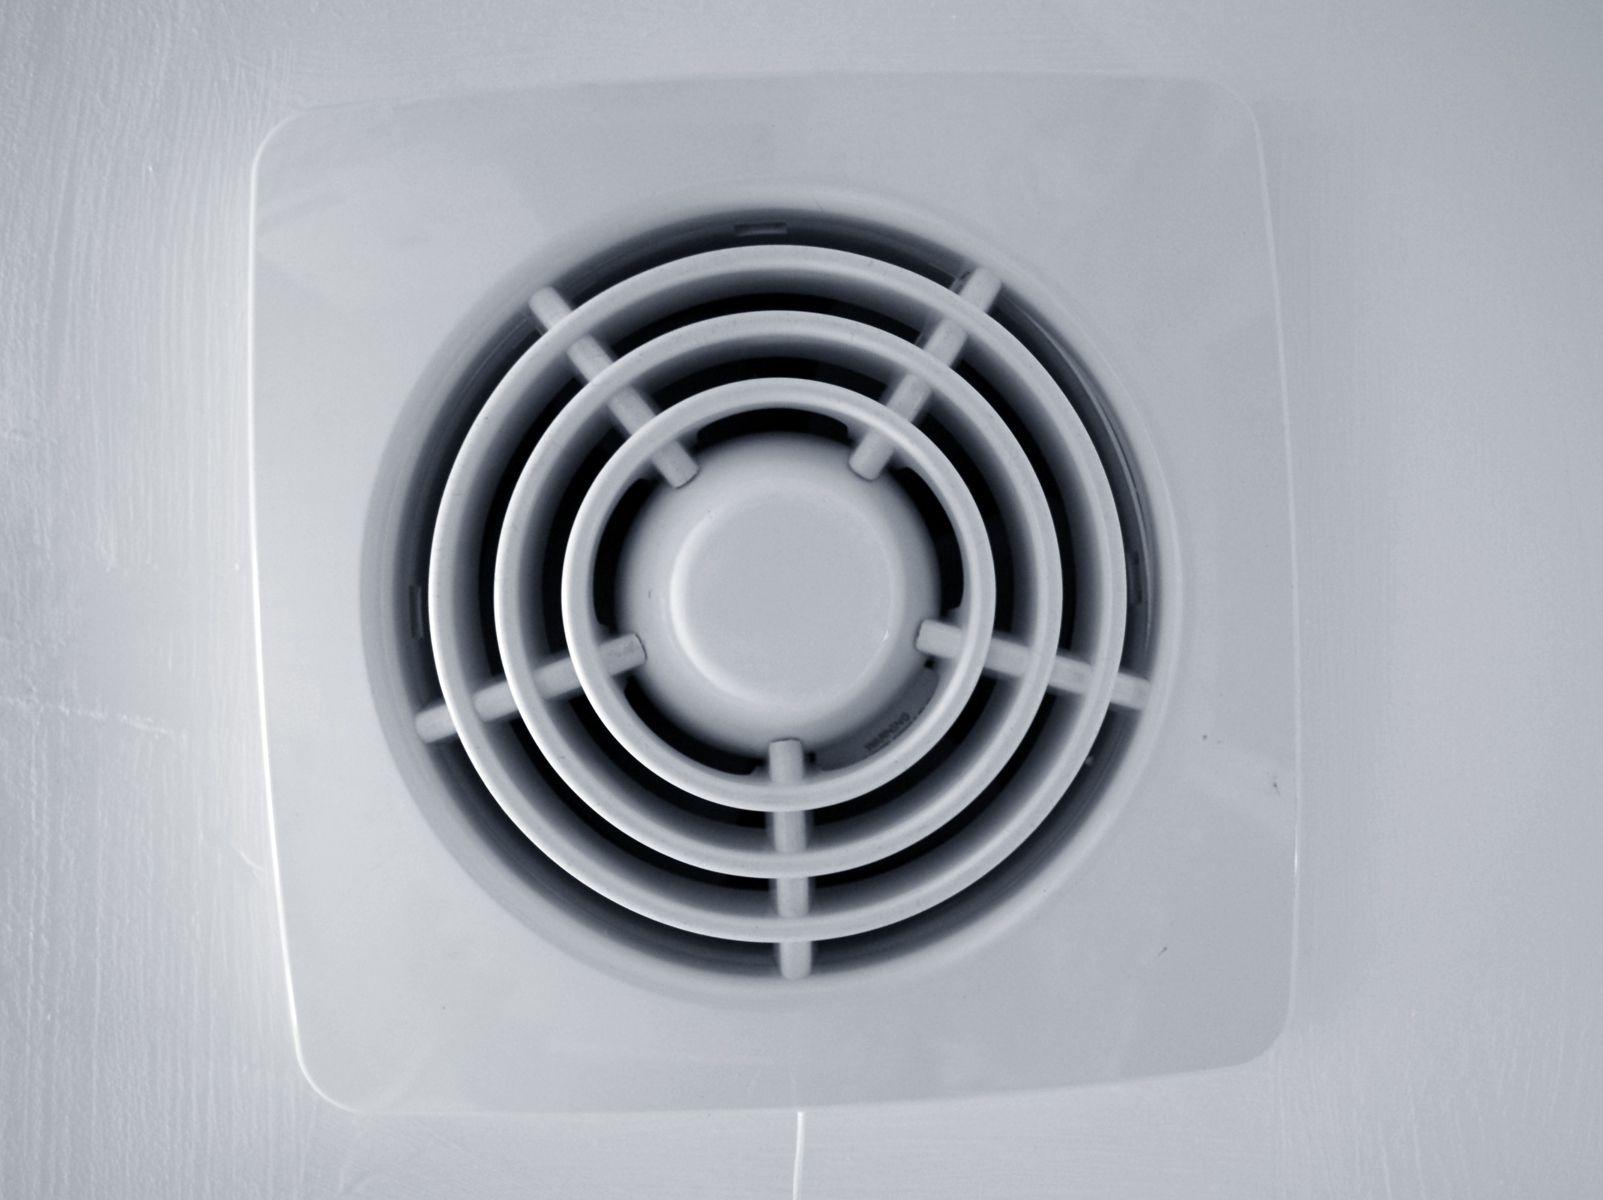 Bathroom fan sizing chart - Position Your Bathroom Exhaust Fan Where It Is Most Useful